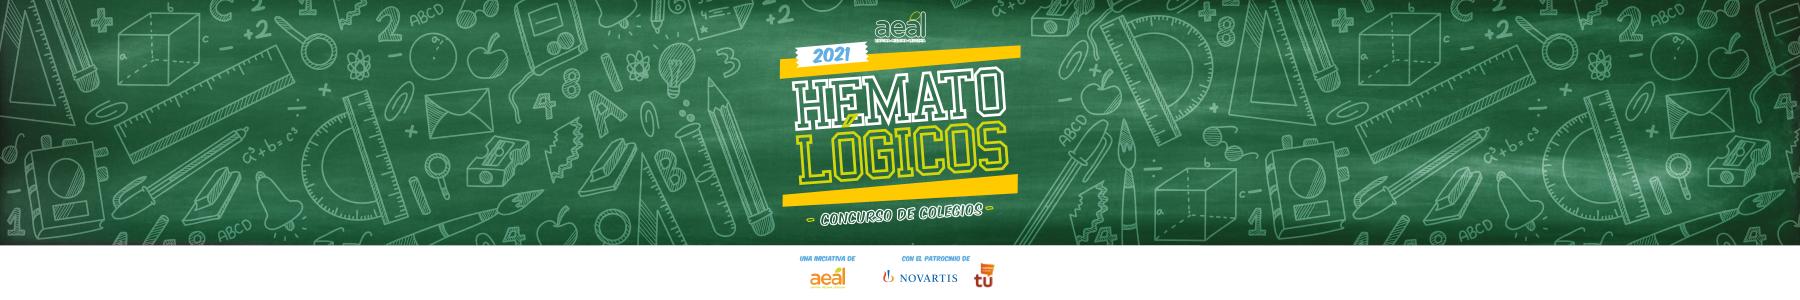 BANNERS_HEMATOLOGICOS_AEAL_2021_webaeal